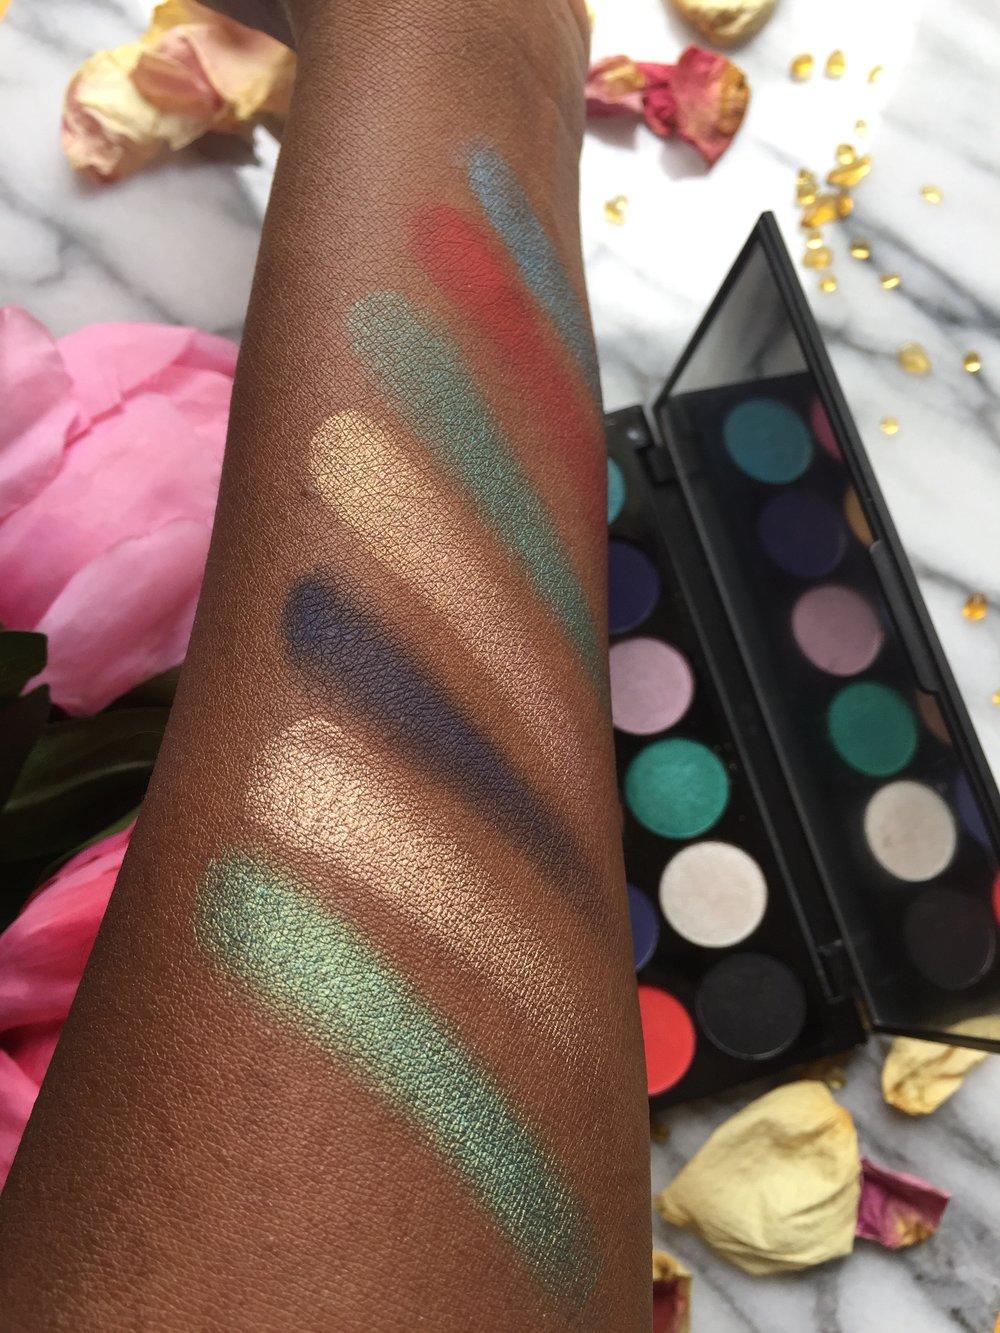 Sleek Lagoon Eyeshadow Palette